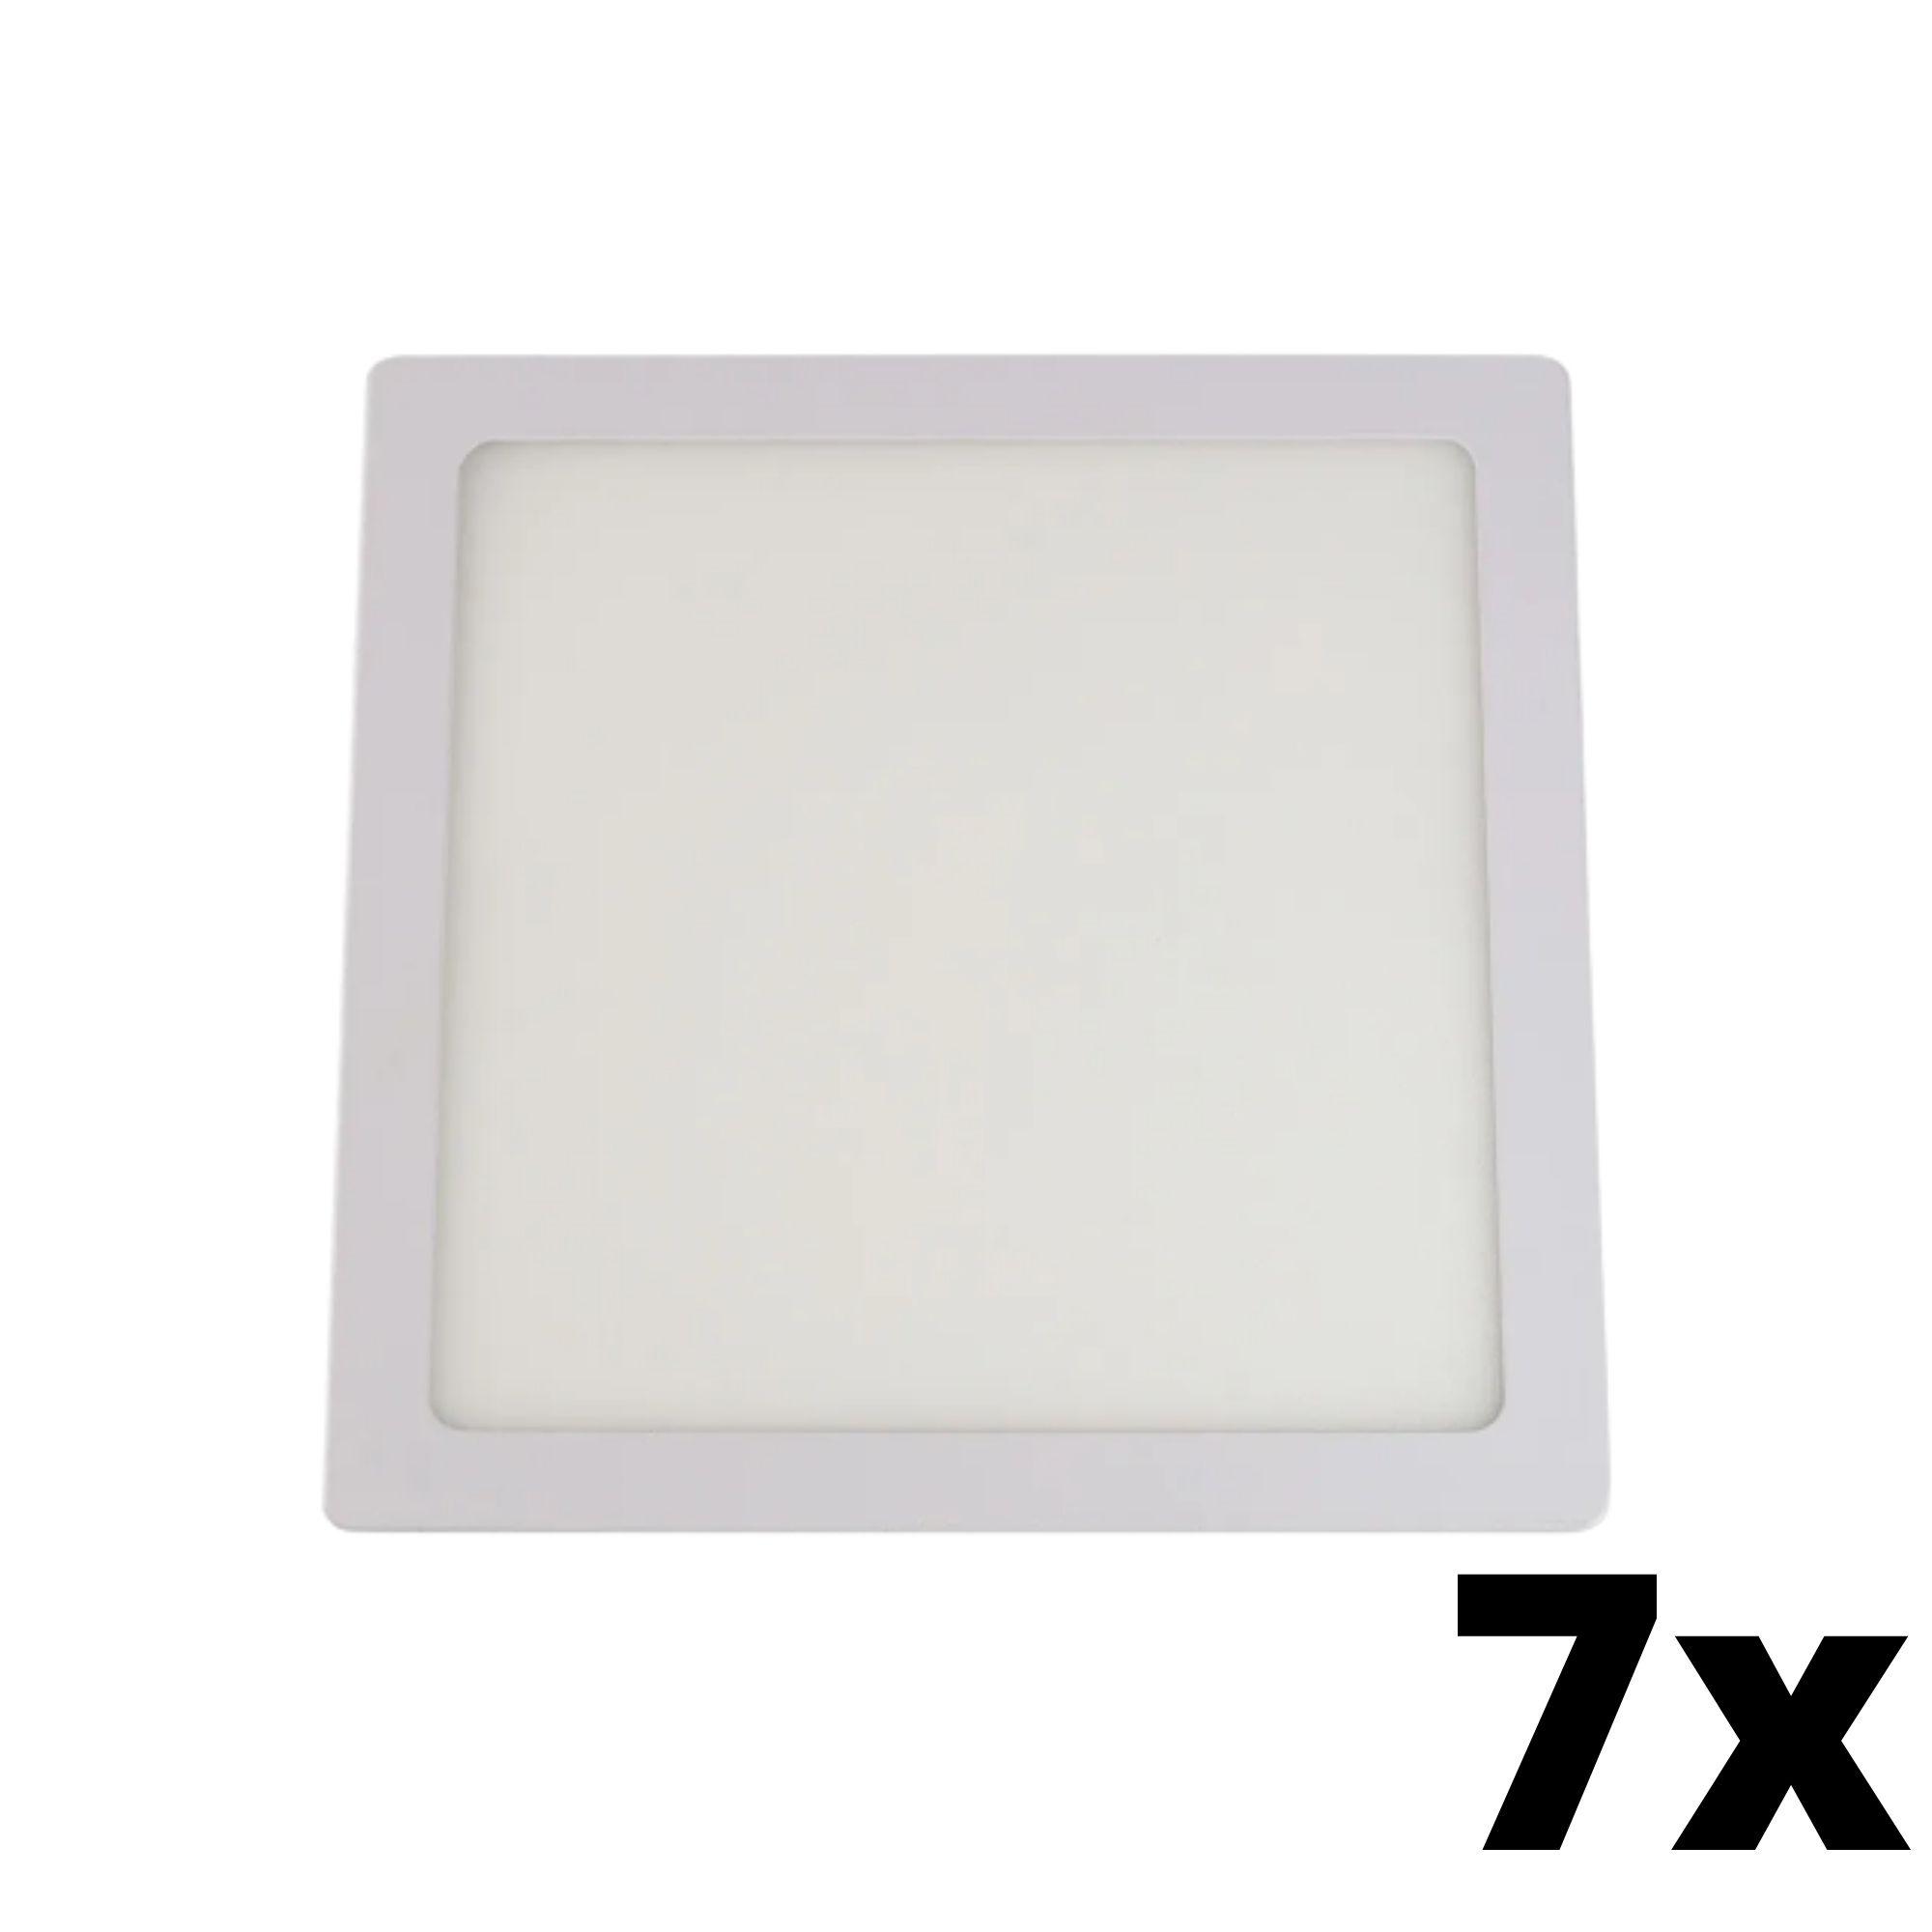 Kit 7 und Painel de Led Embutir 18w Quadrado 6500k